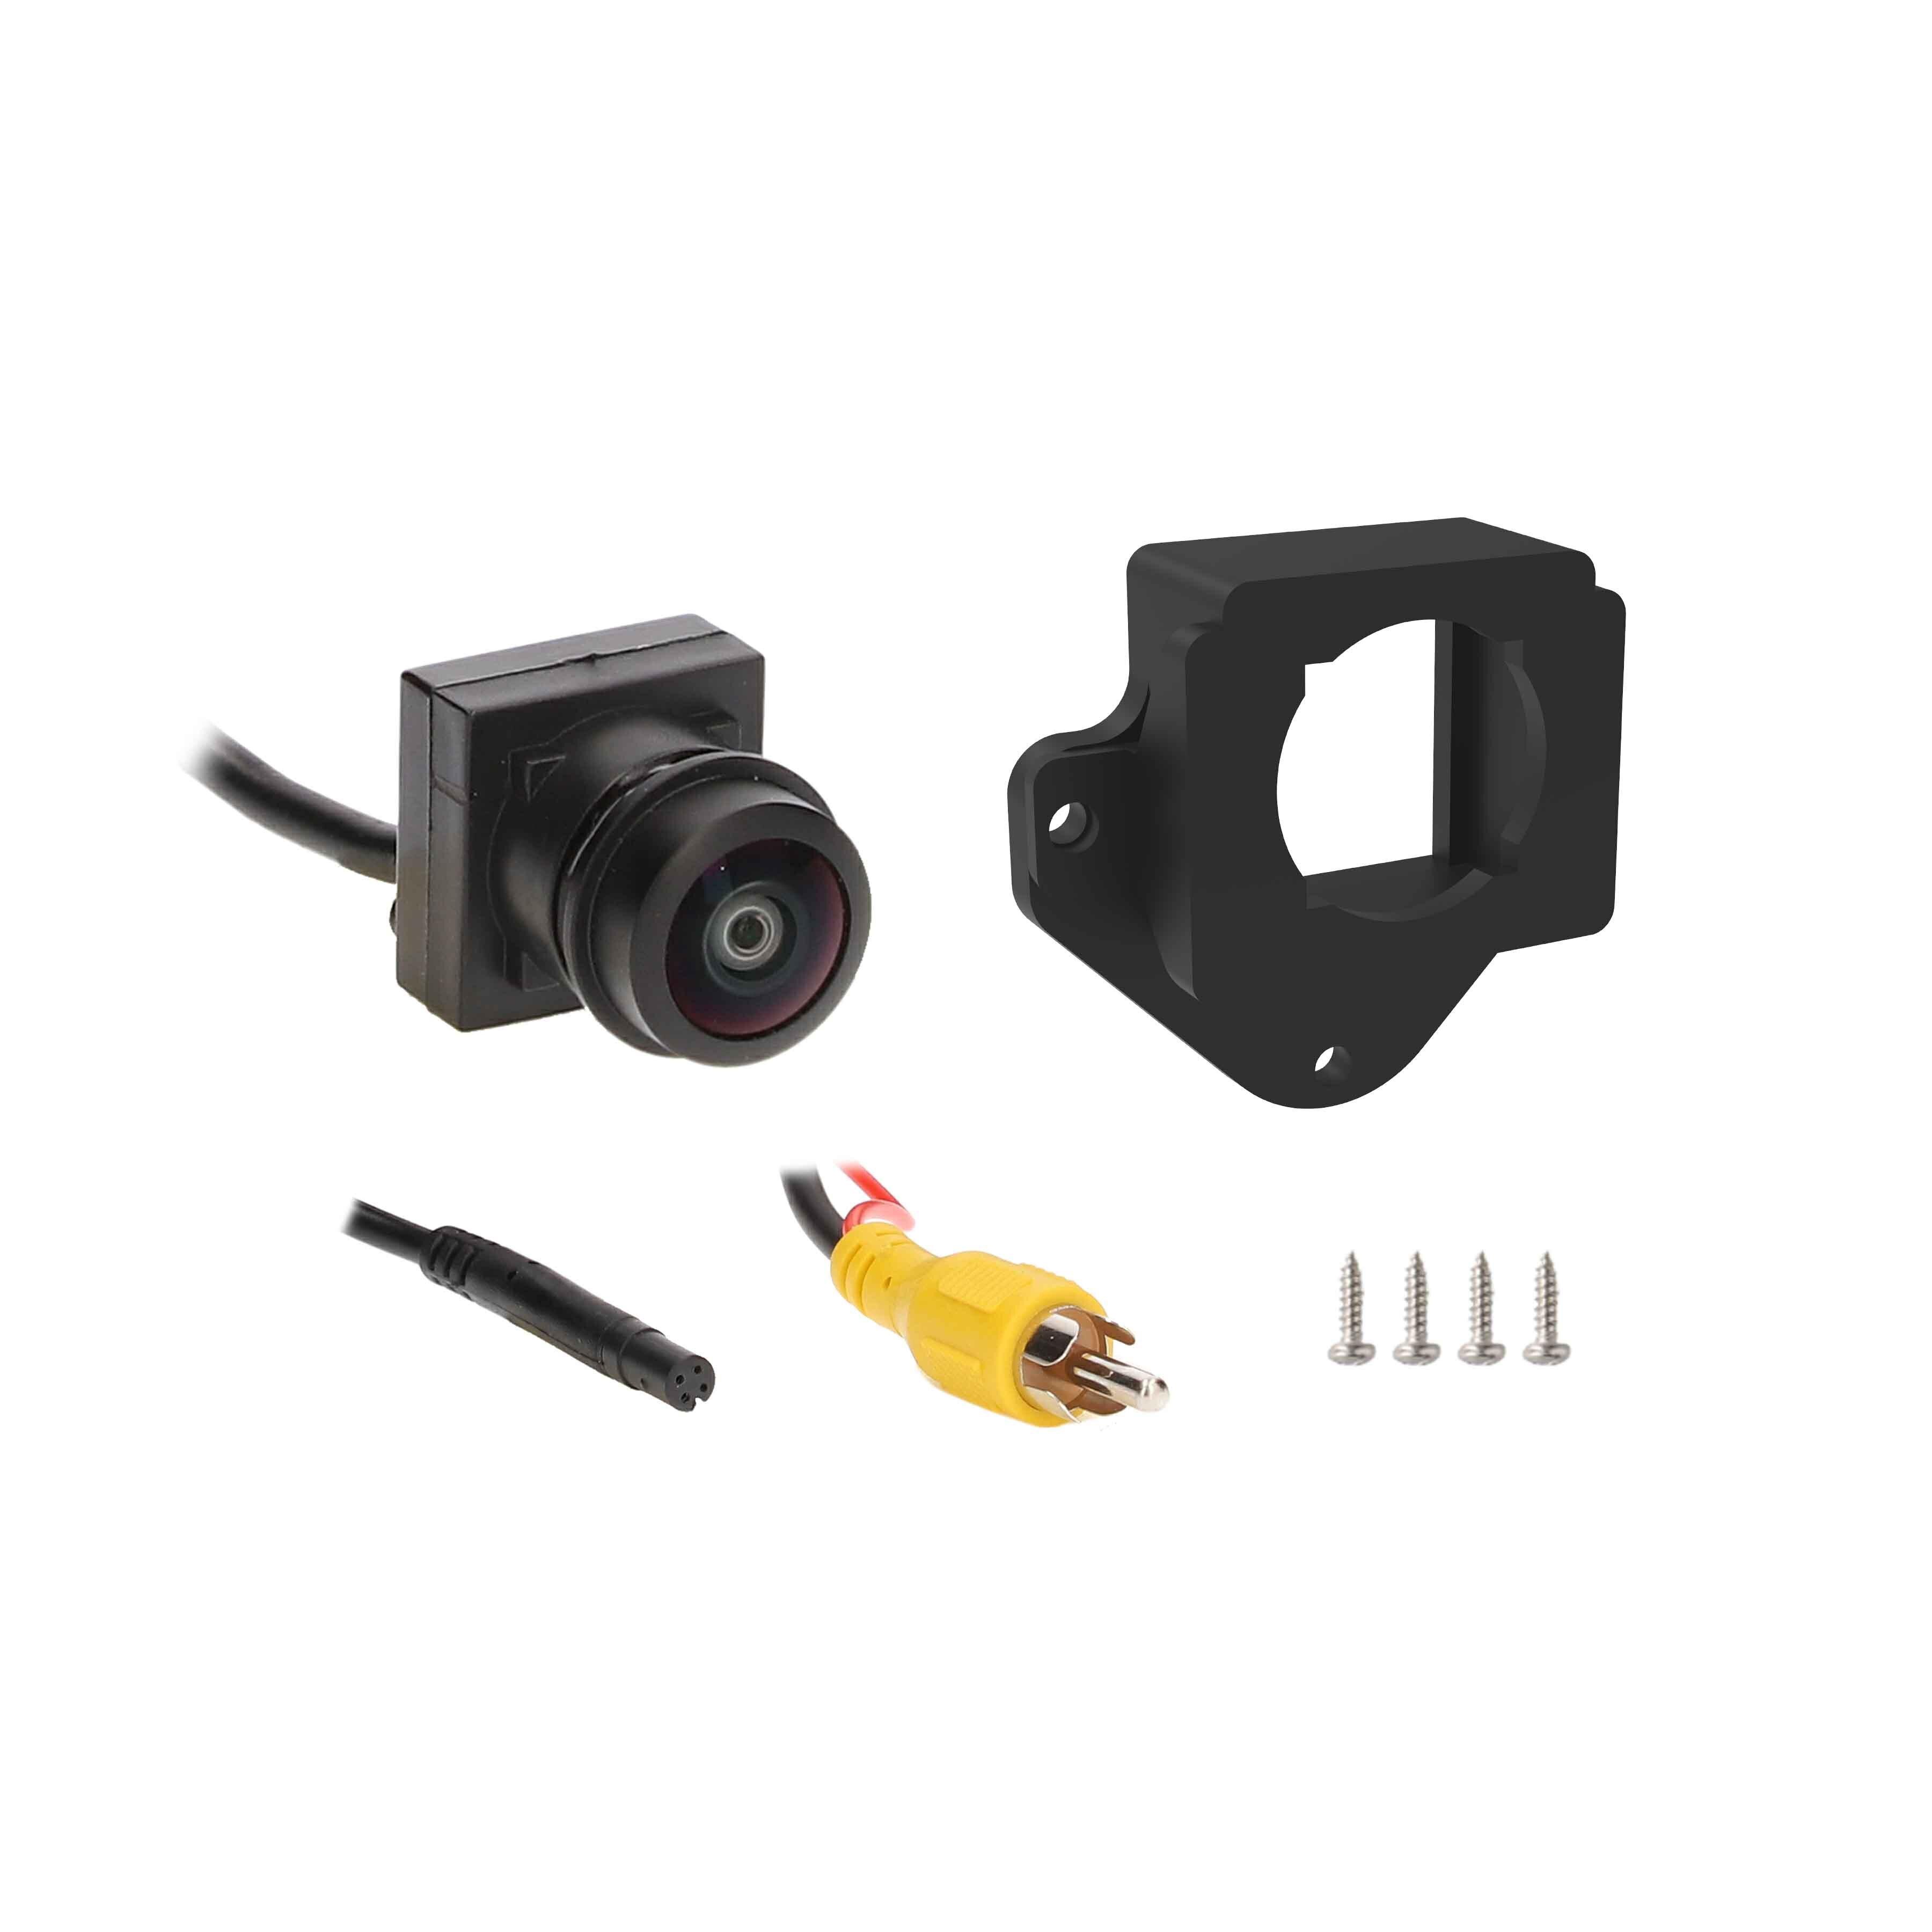 Jeep Wrangler JL 2018-Up Backup Camera Replacement Kit